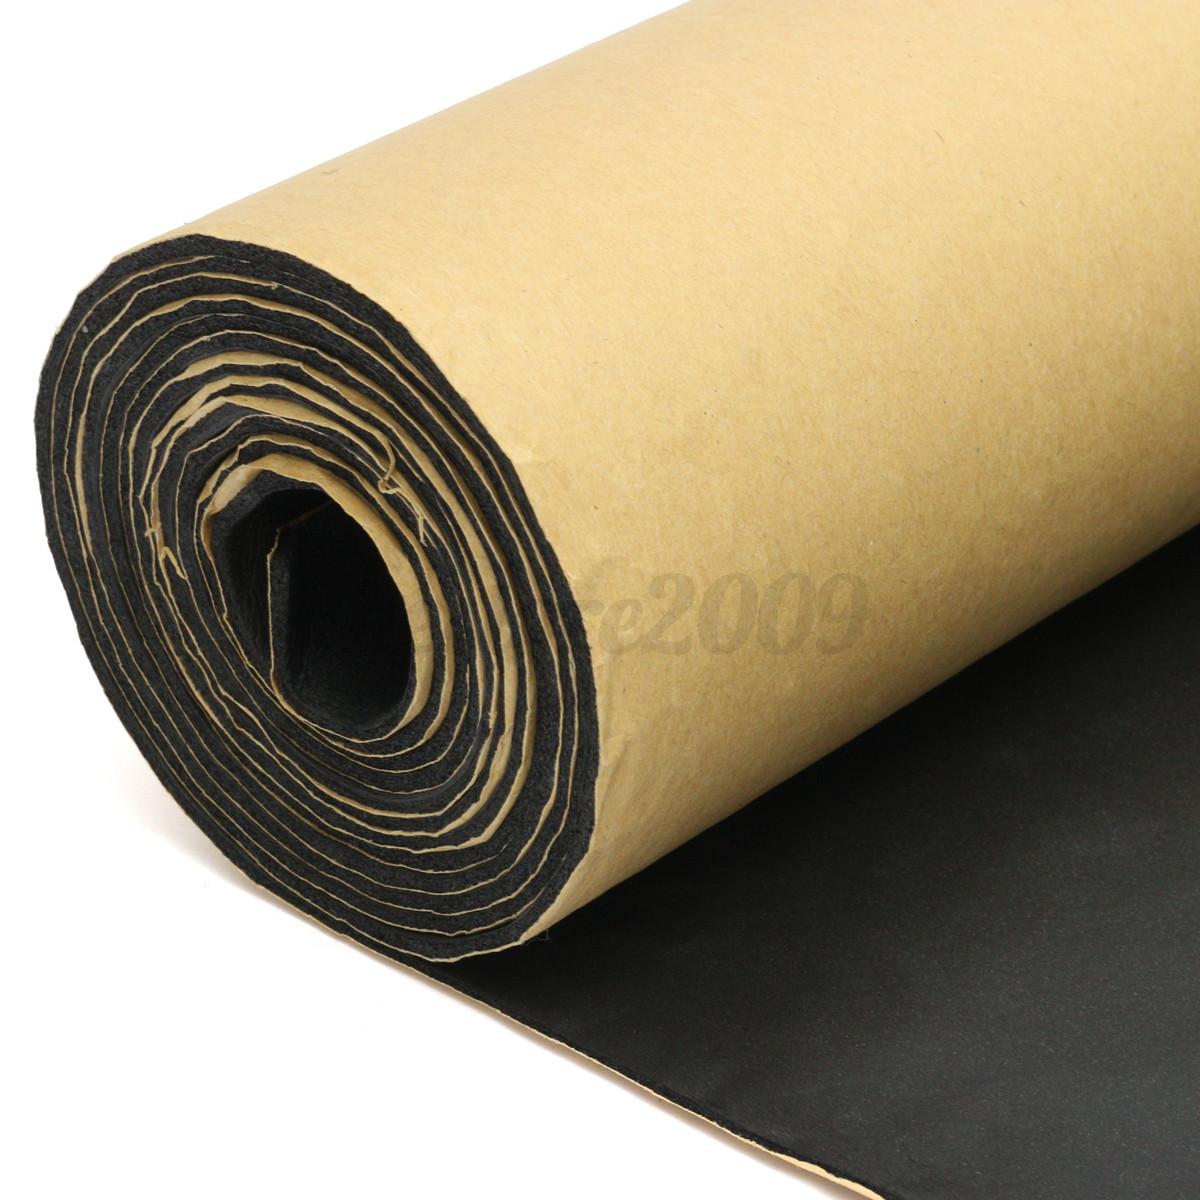 Acoustic Foam Insulation : Mm car sound proofing deadening insulation foam mat